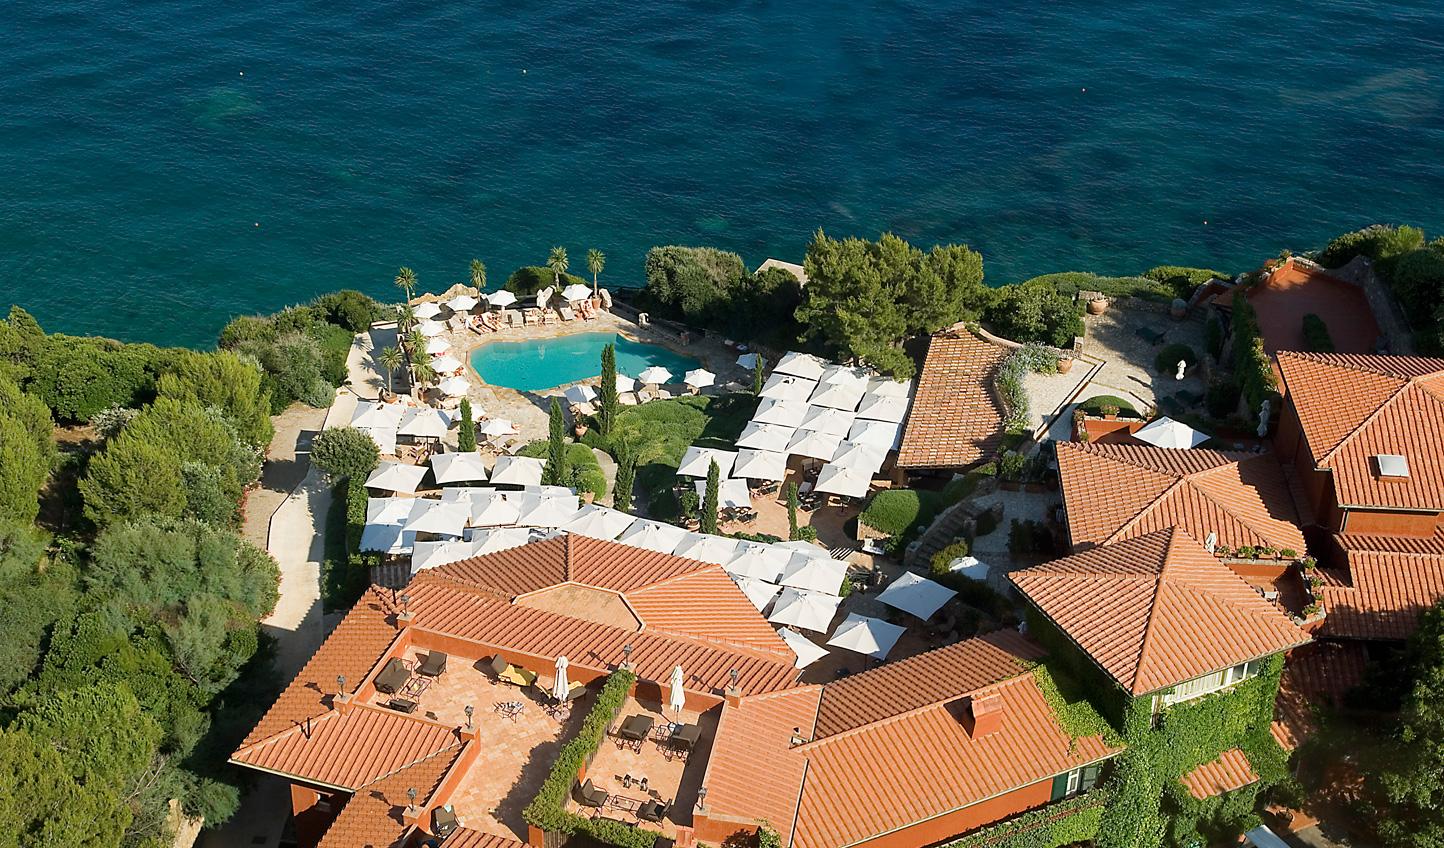 Get in on the secret at Hotel Il Pellicano